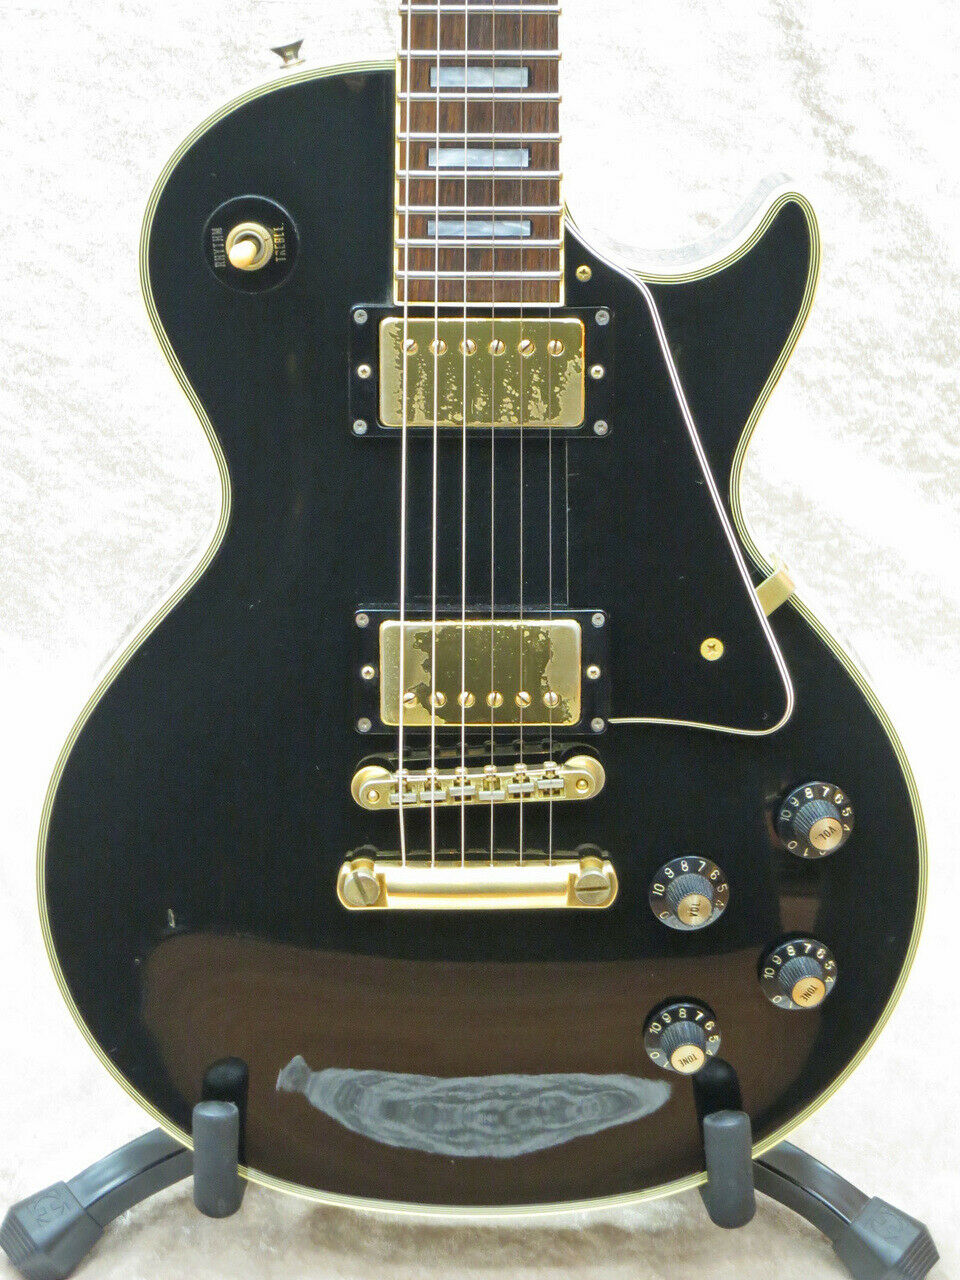 Greco EGC-70 electric guitar Japan rare beautiful vintage popular EMS F   S